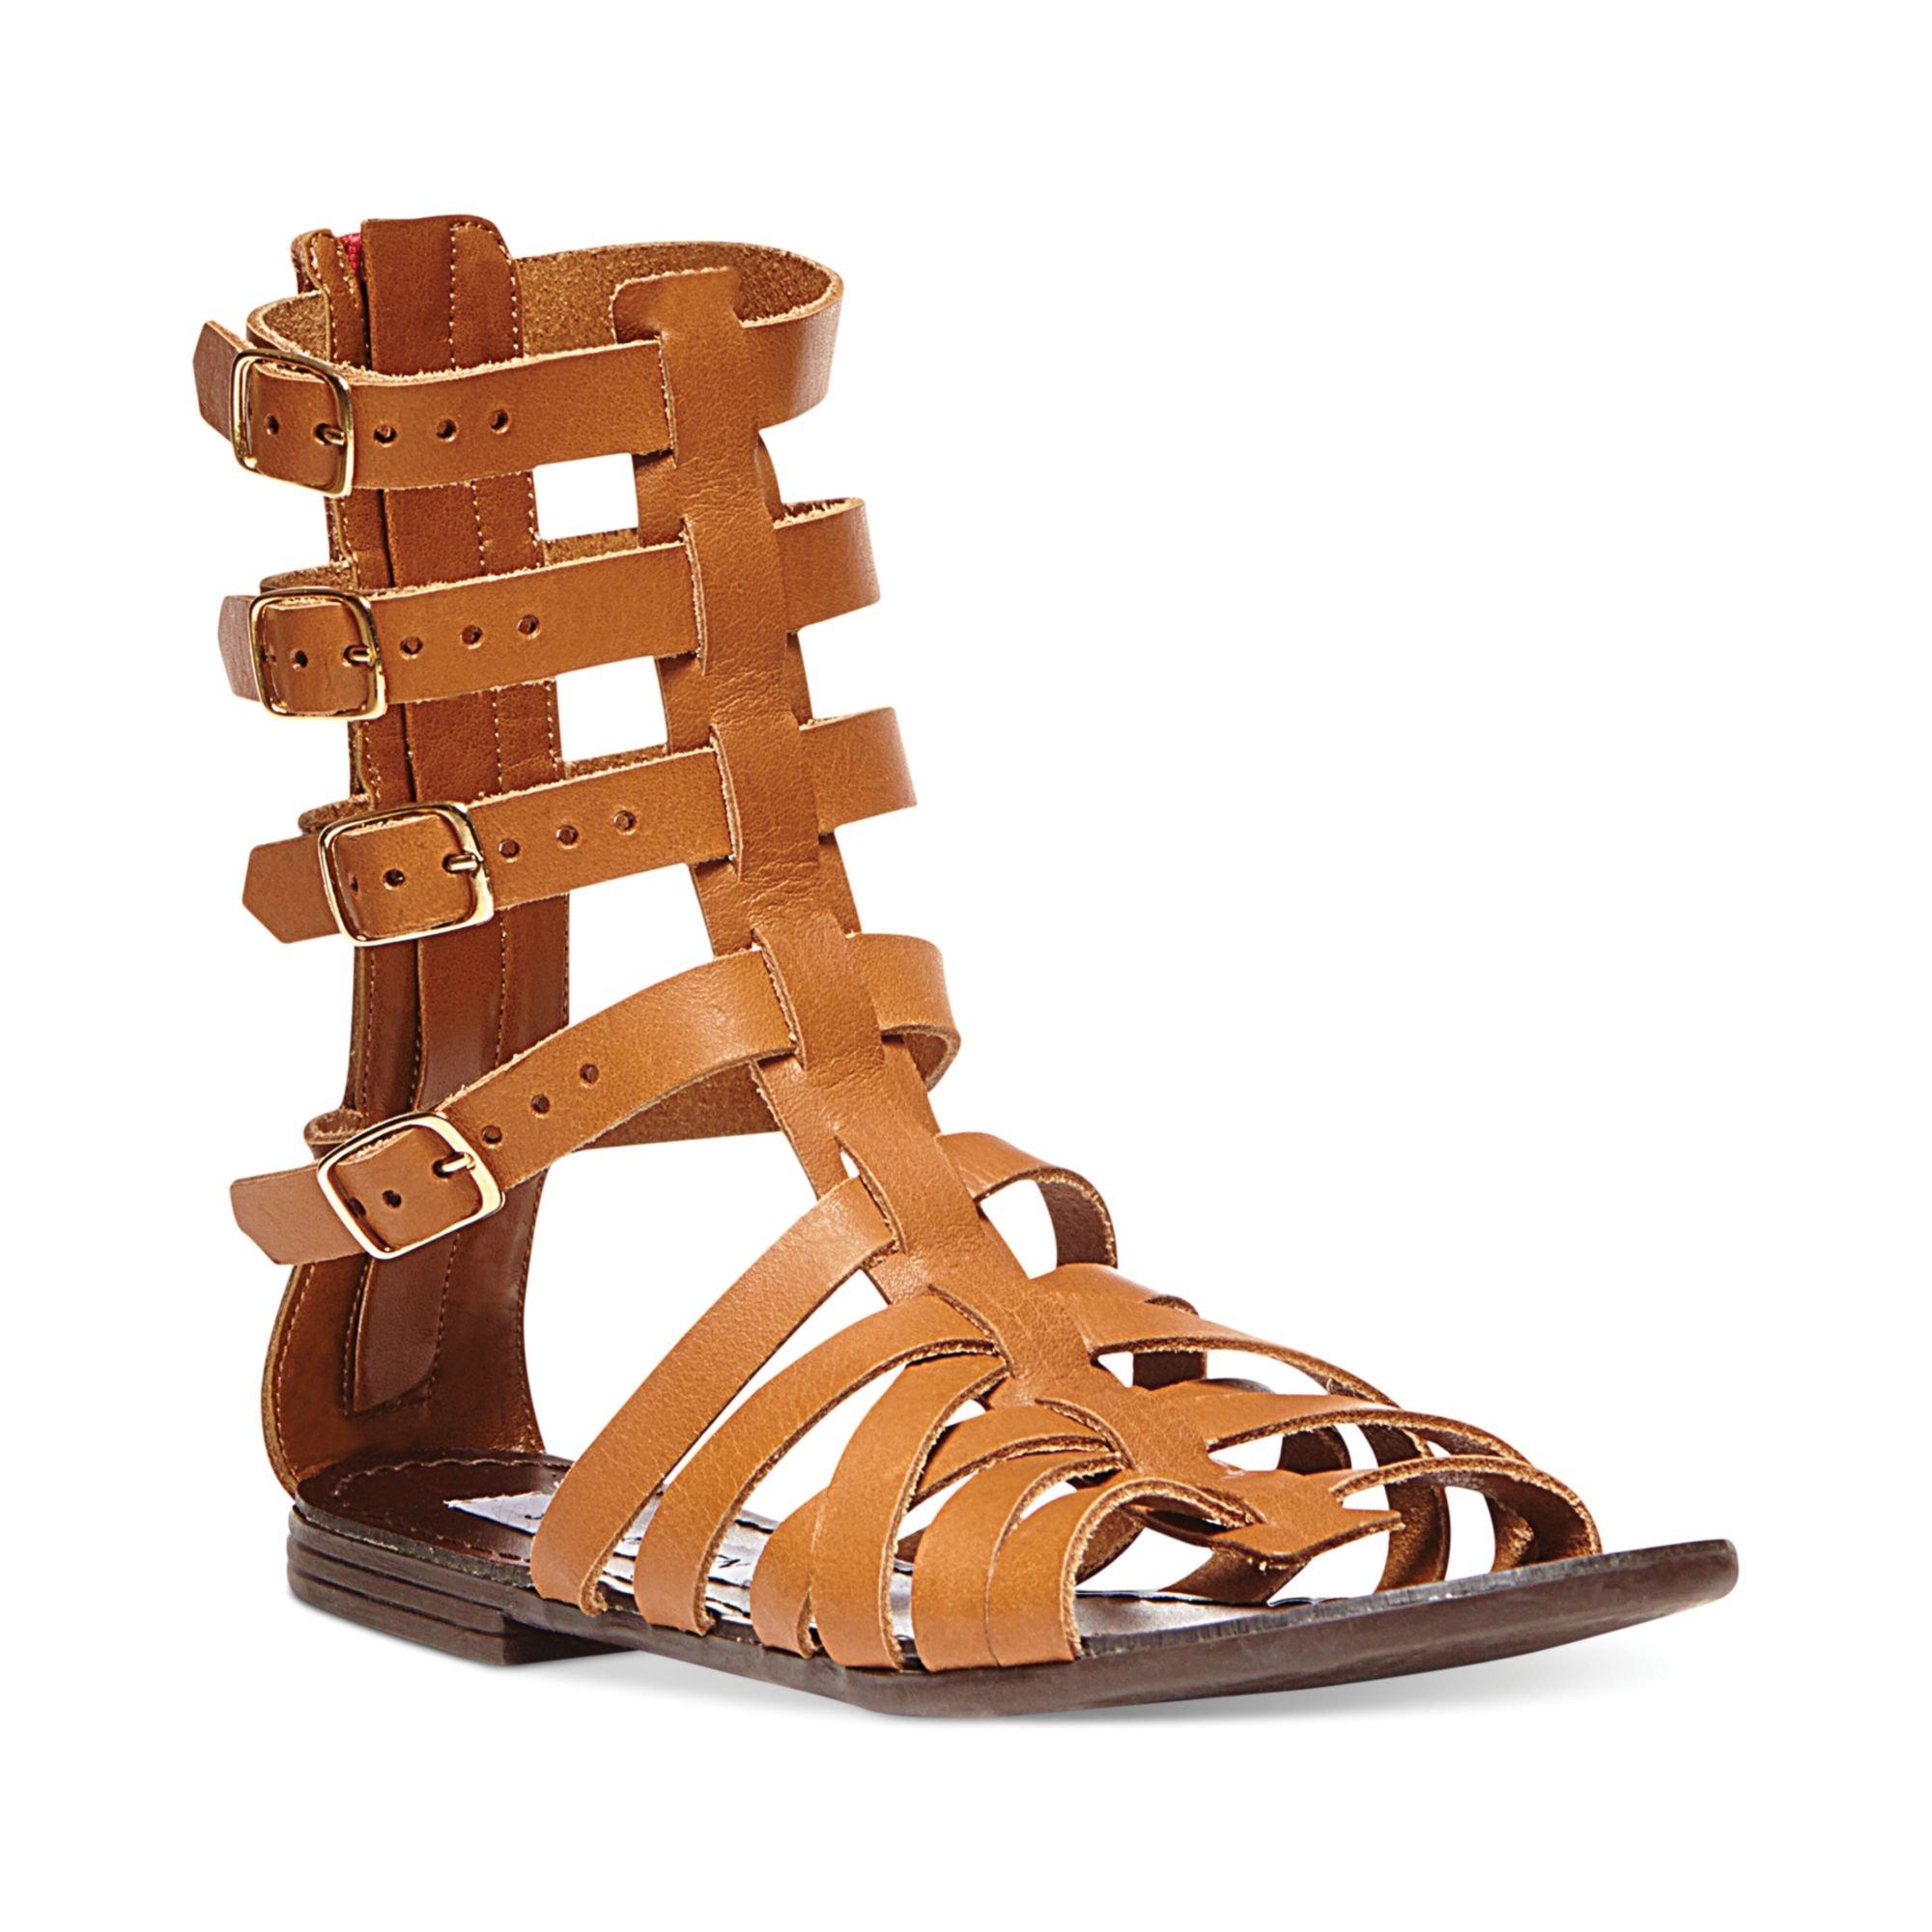 2014 New Roman Gladiator Sandals Gold Leaves Designer